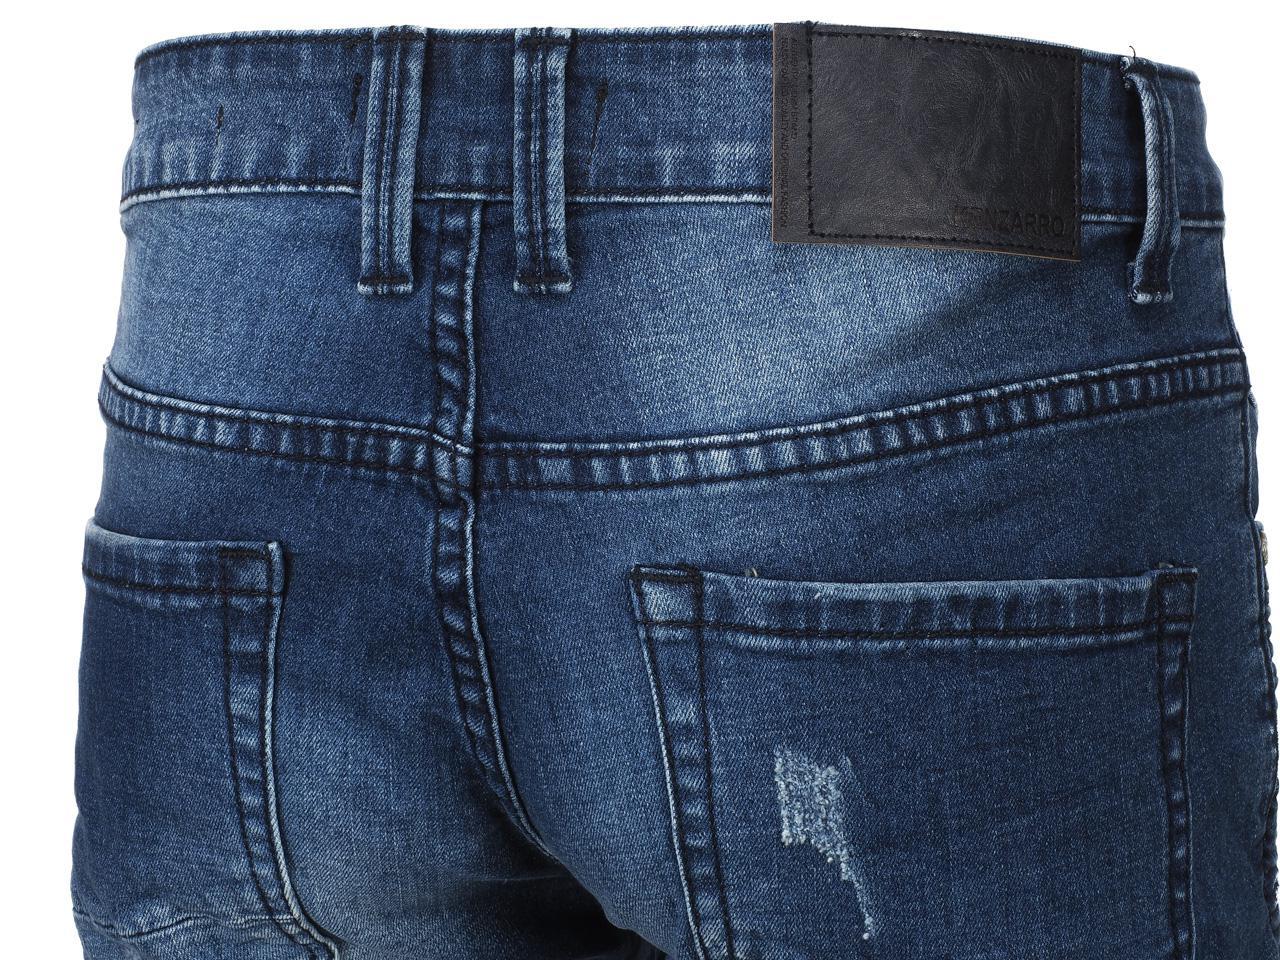 Jeans-Pants-Senders-Angeles-Used-Blue-H-Blue-39982-New thumbnail 4